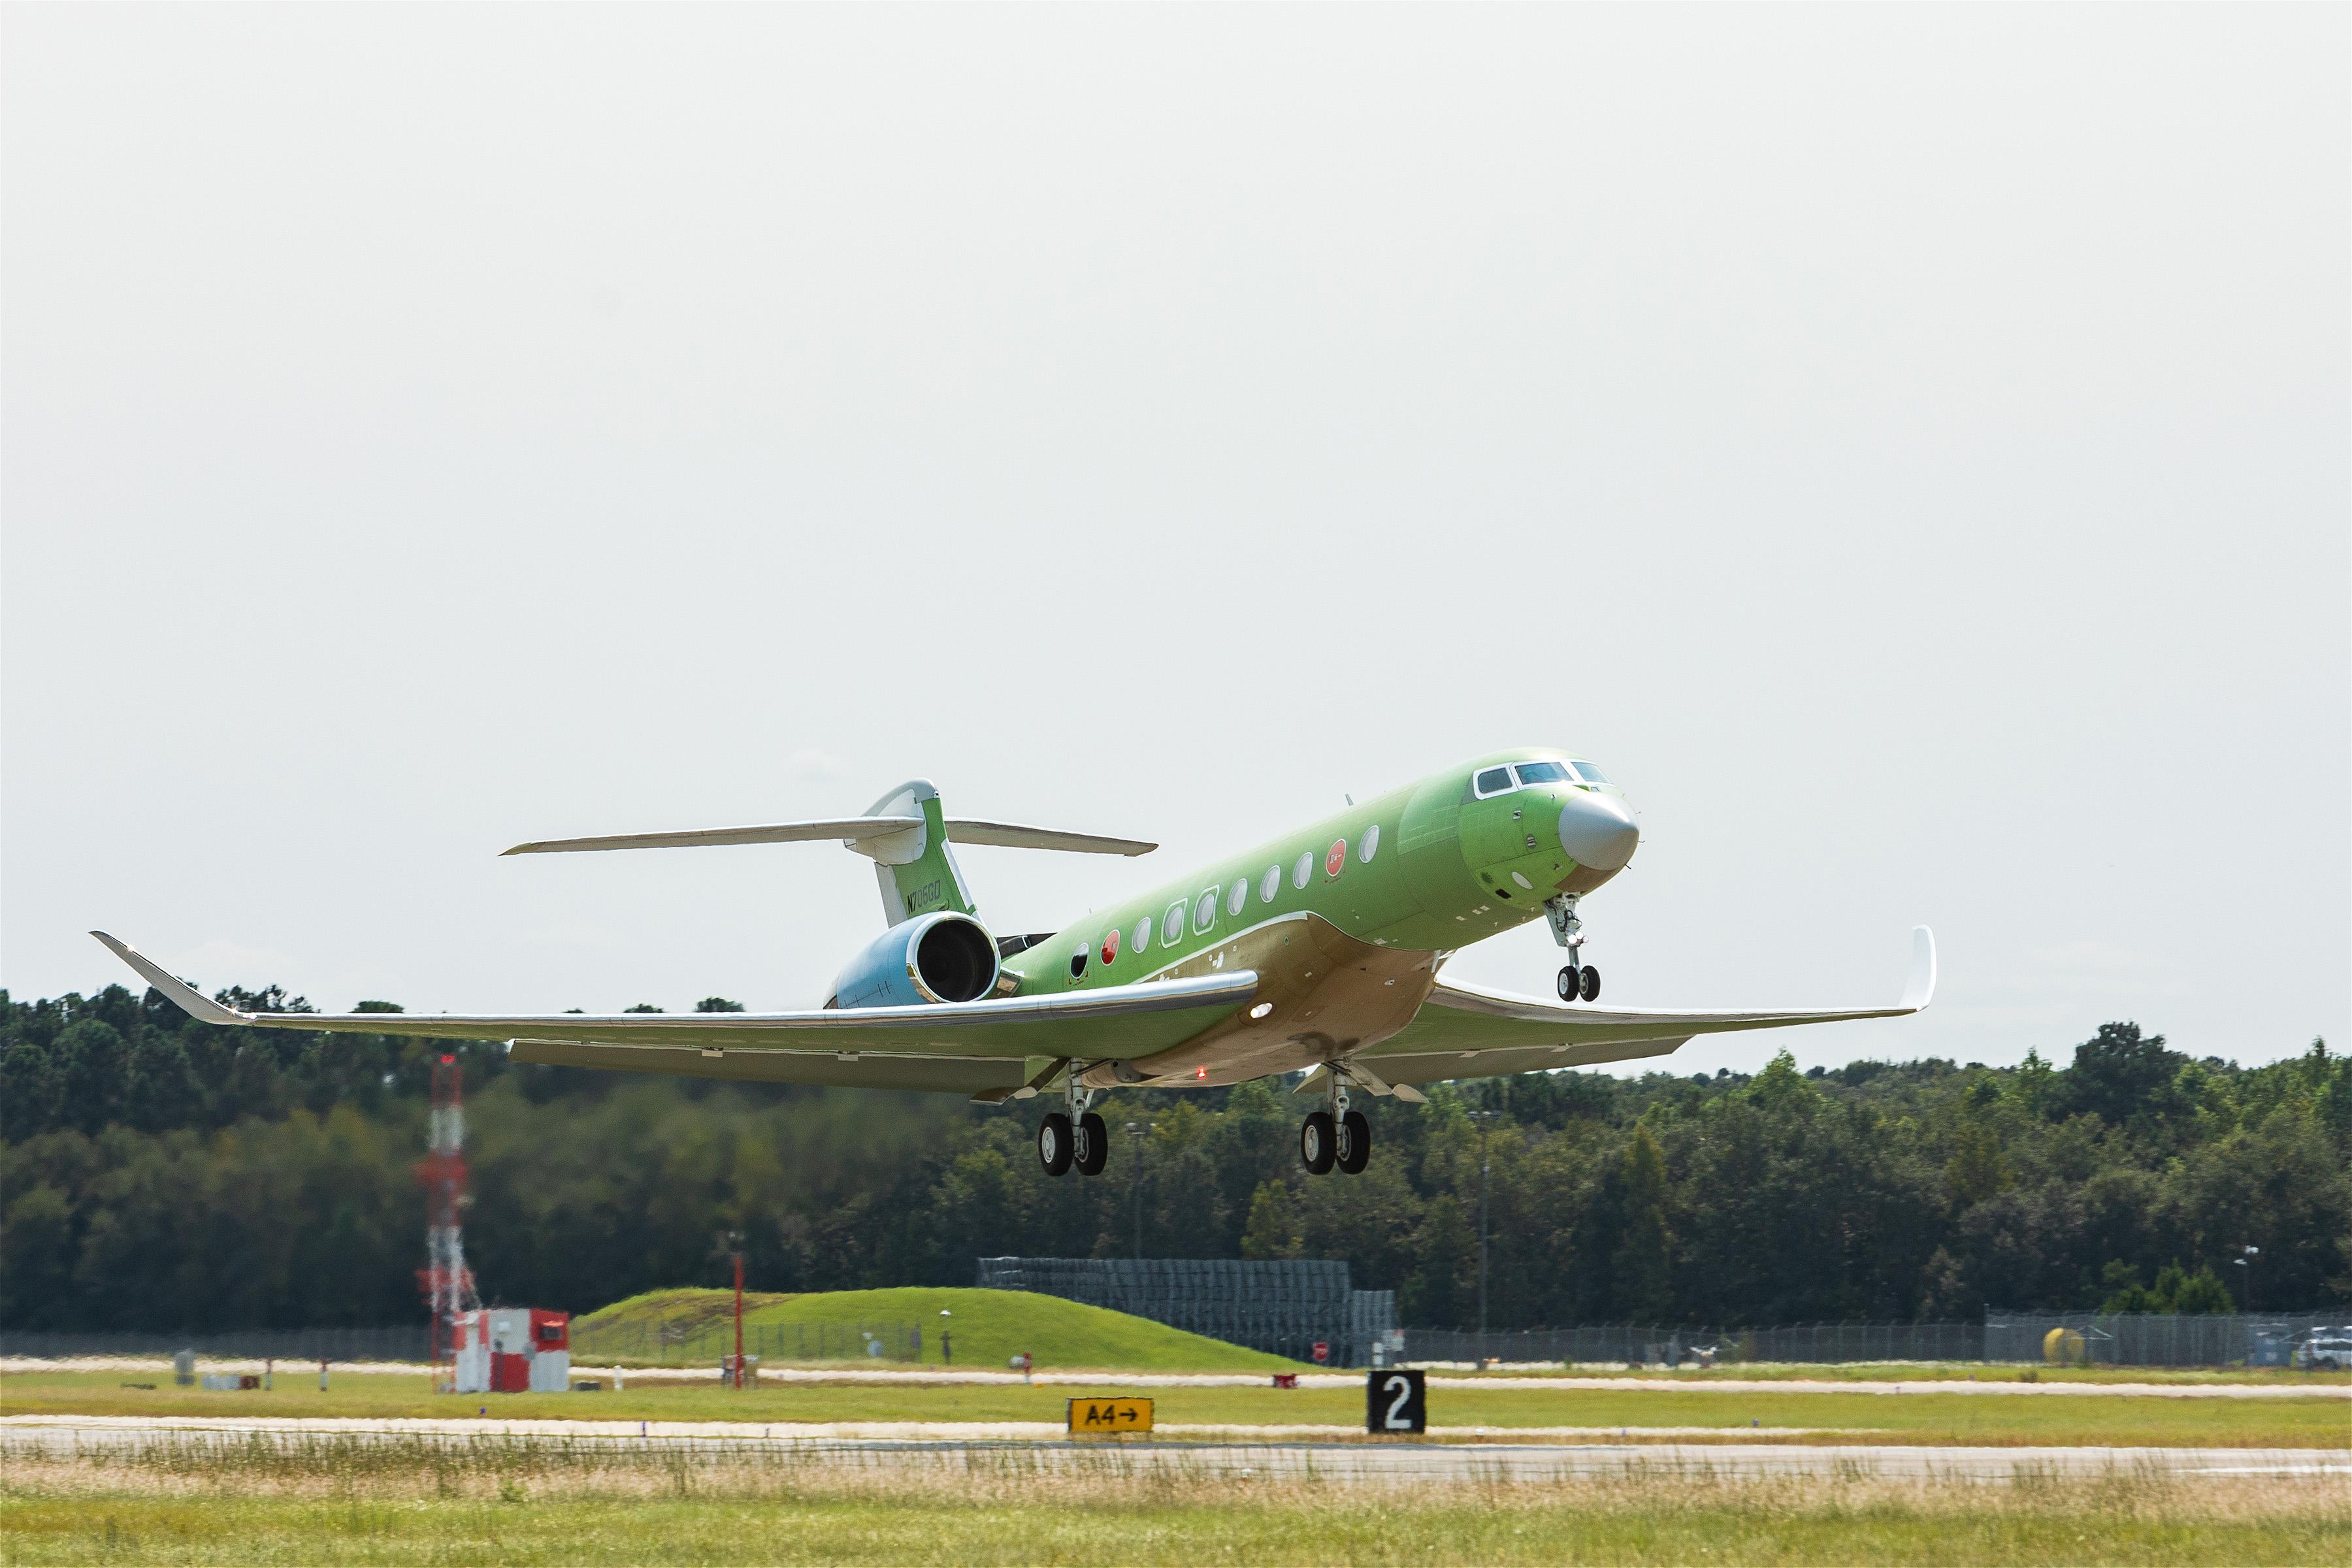 Gulfstream-Launches-Fourth-G700-Test-Aircraft.202001002.jpg